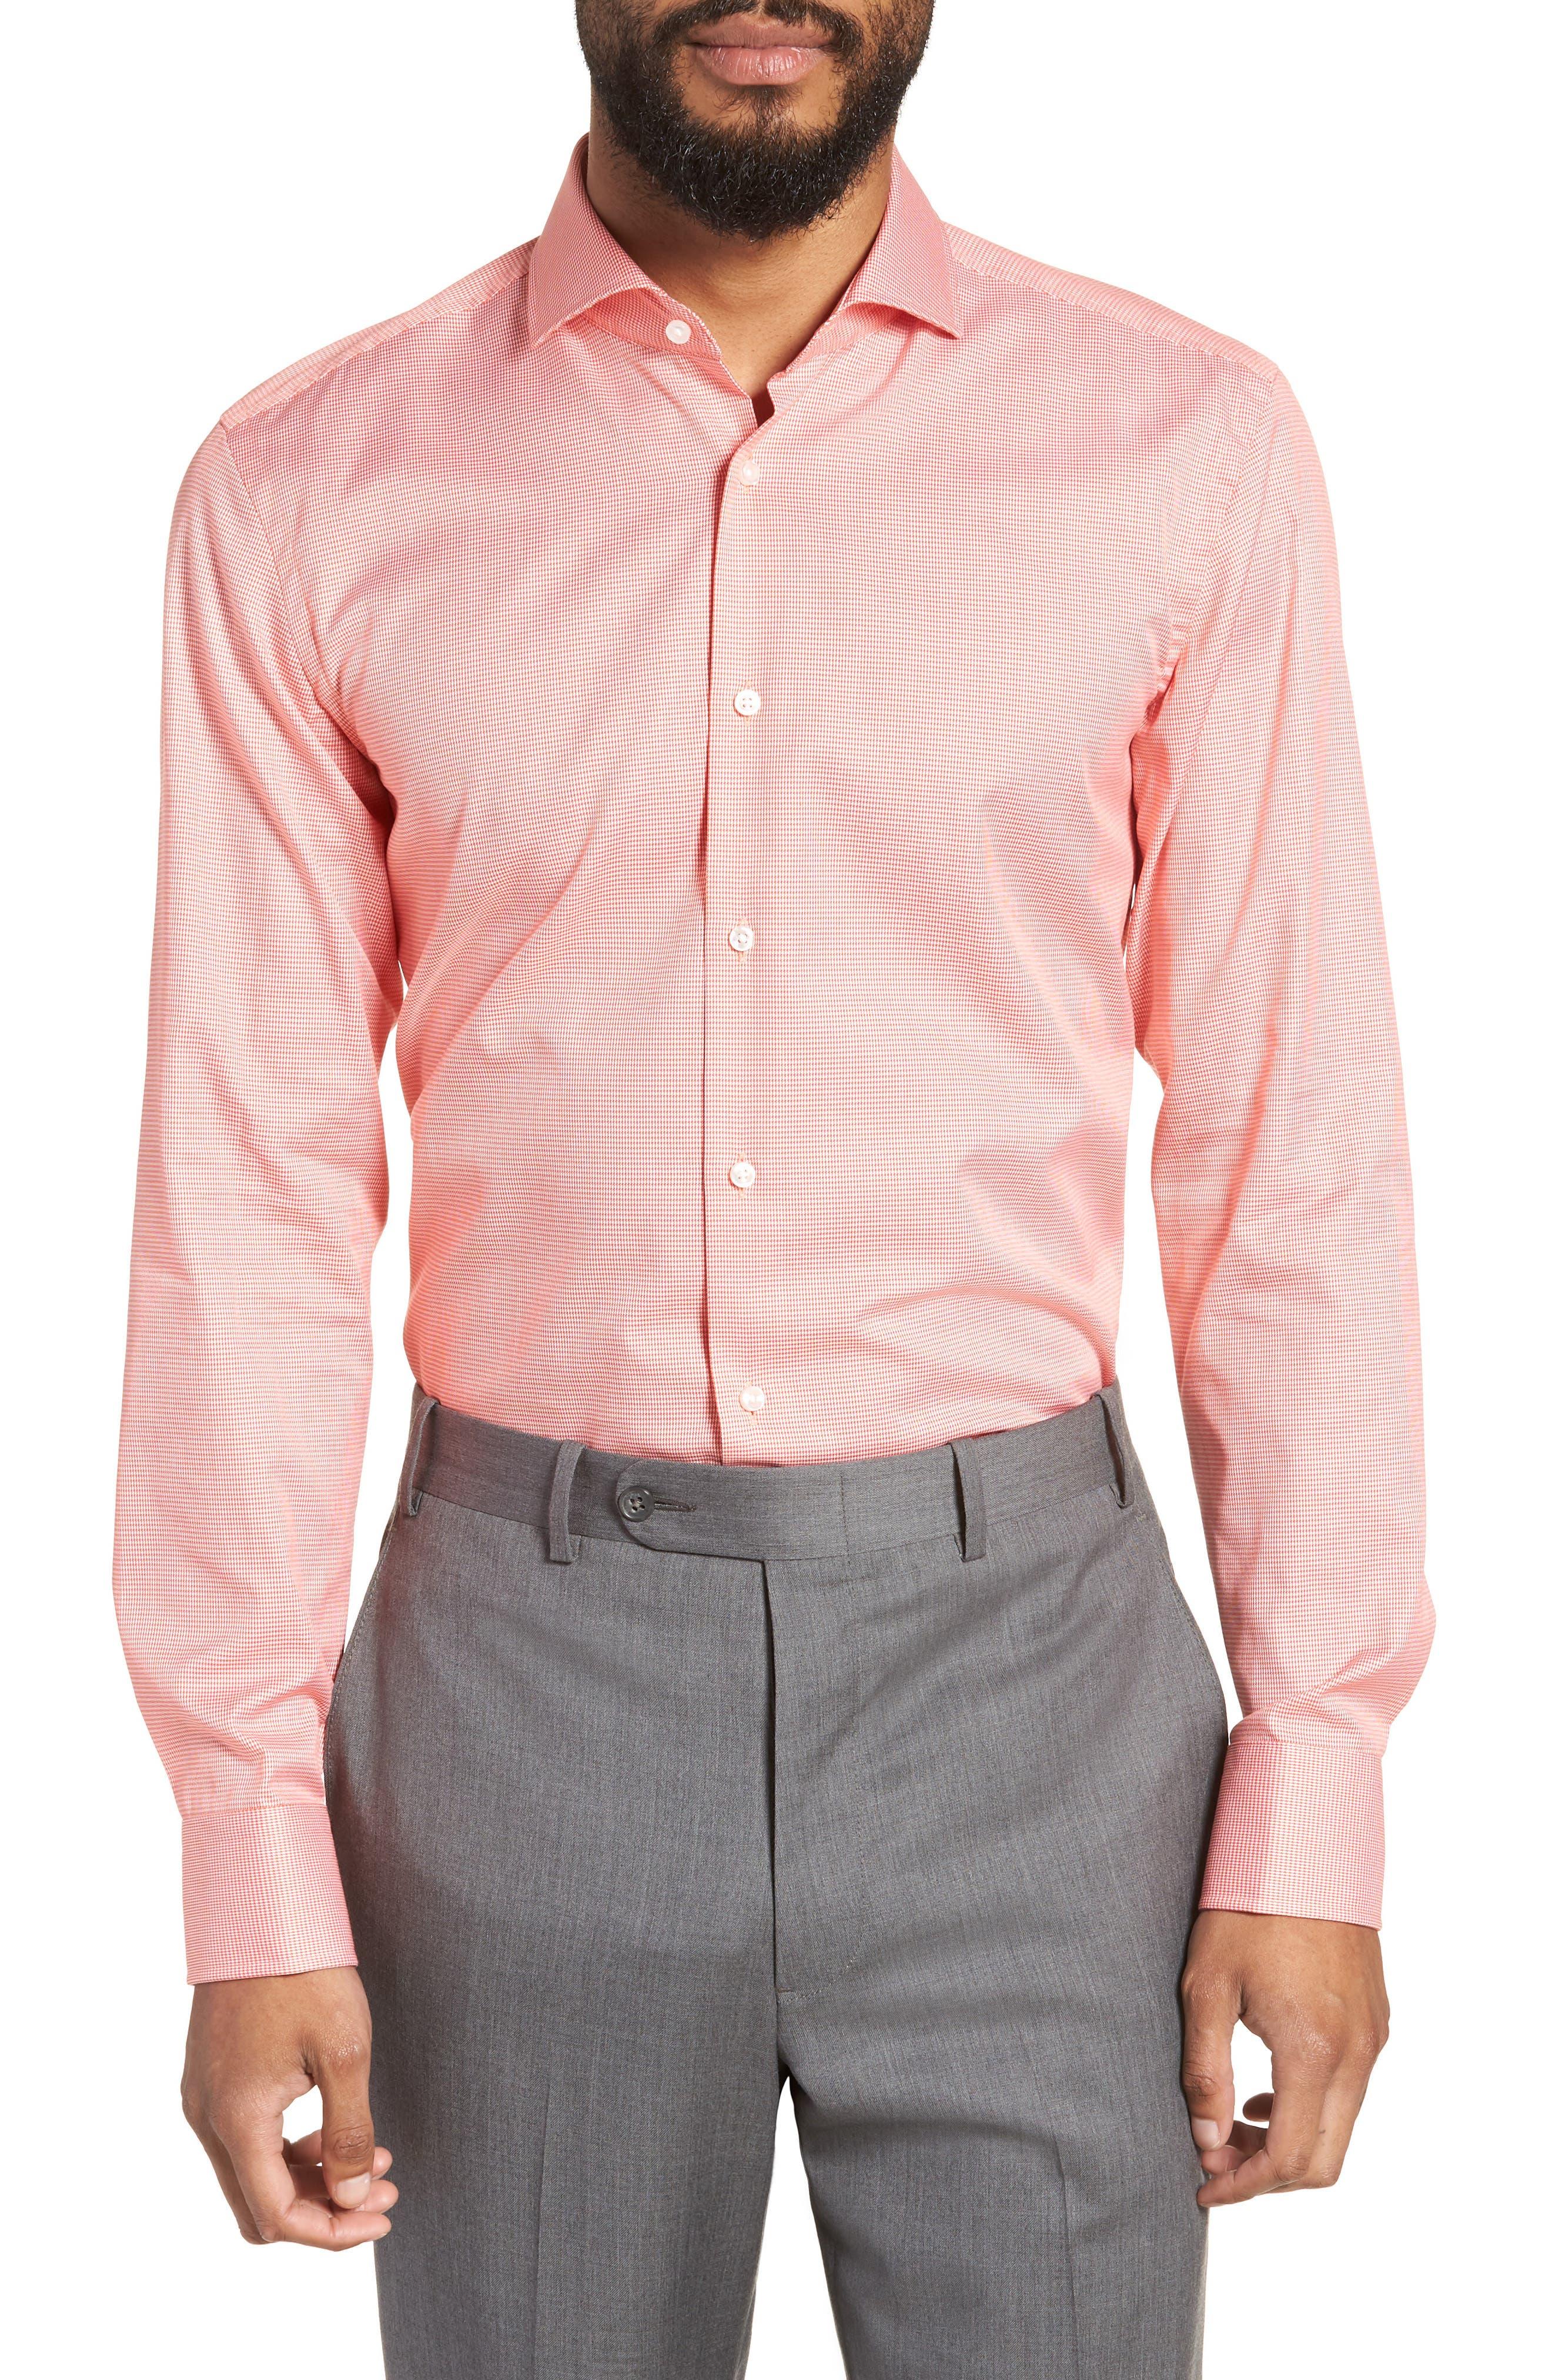 Jason Slim Fit Houndstooth Dress Shirt,                         Main,                         color, 813